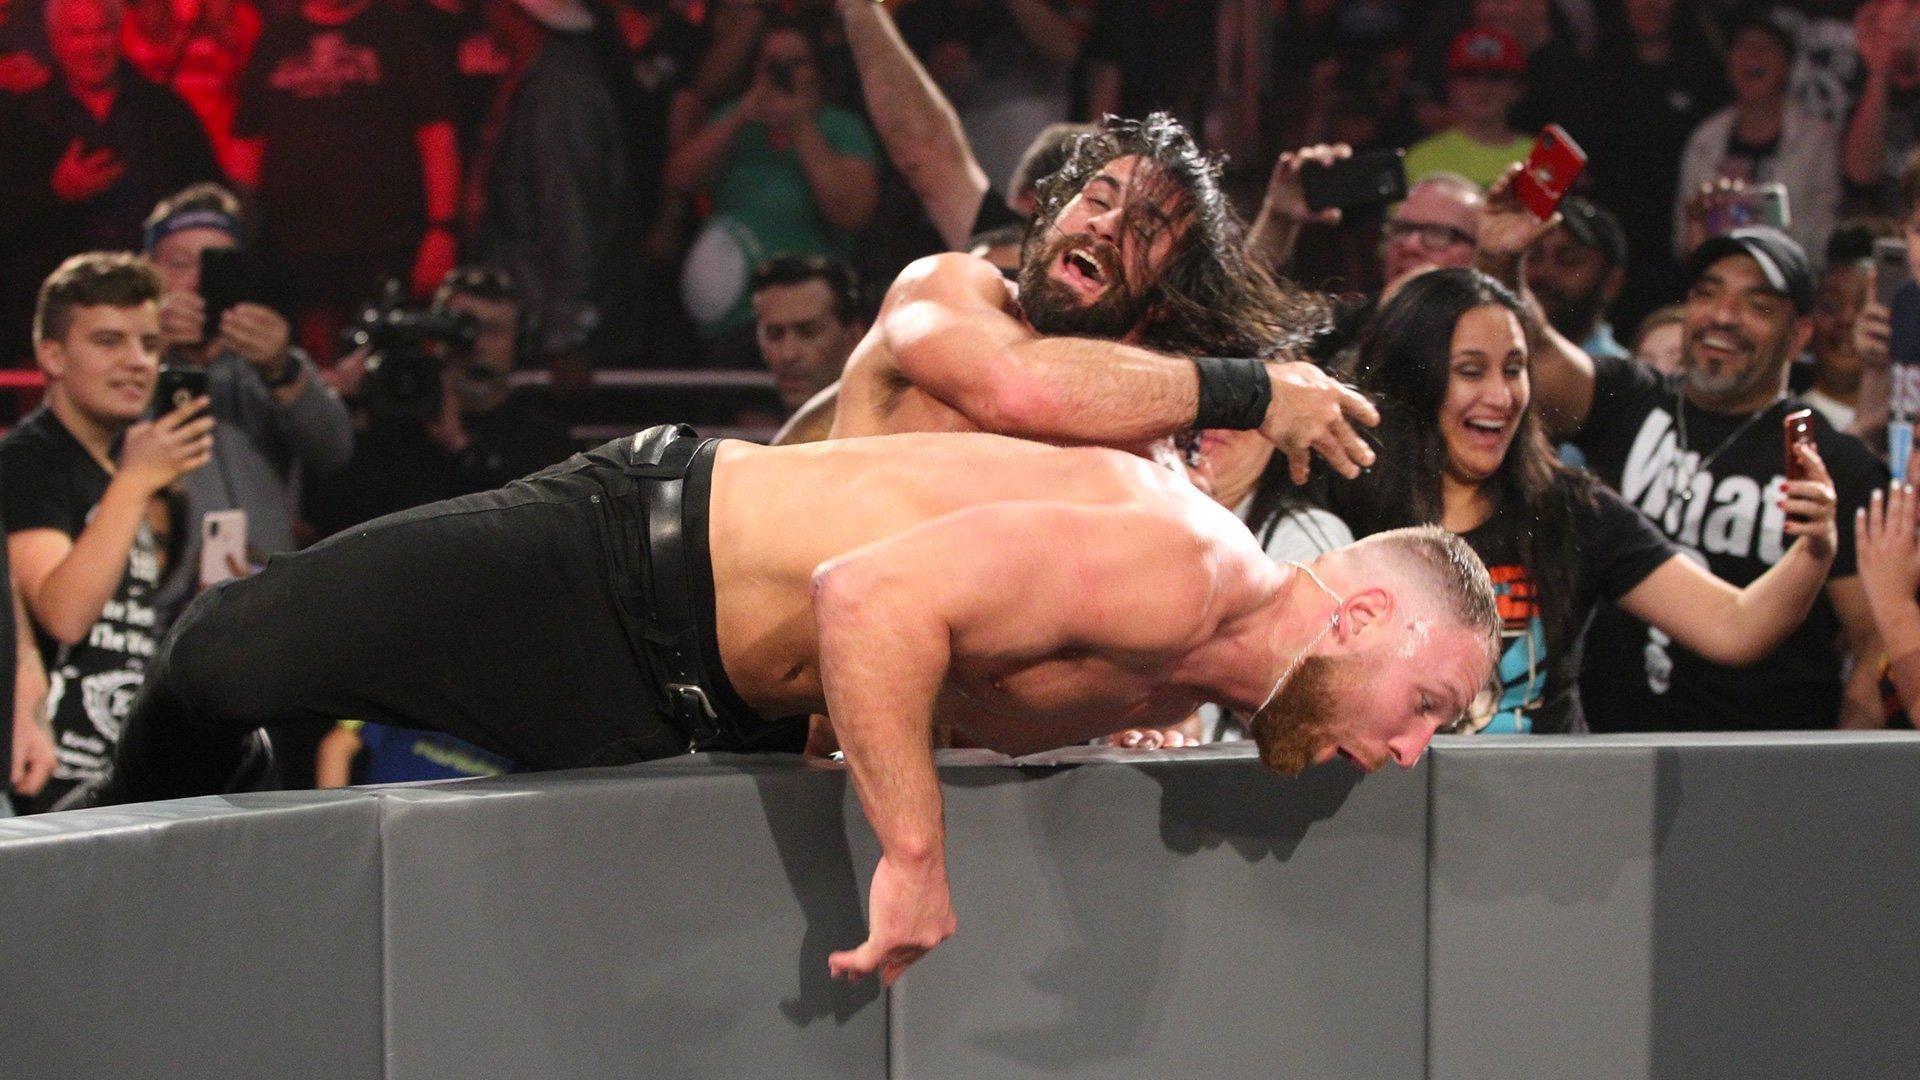 WWE Raw Season 27 :Episode 1  January 7, 2019 (Orlando, FL)